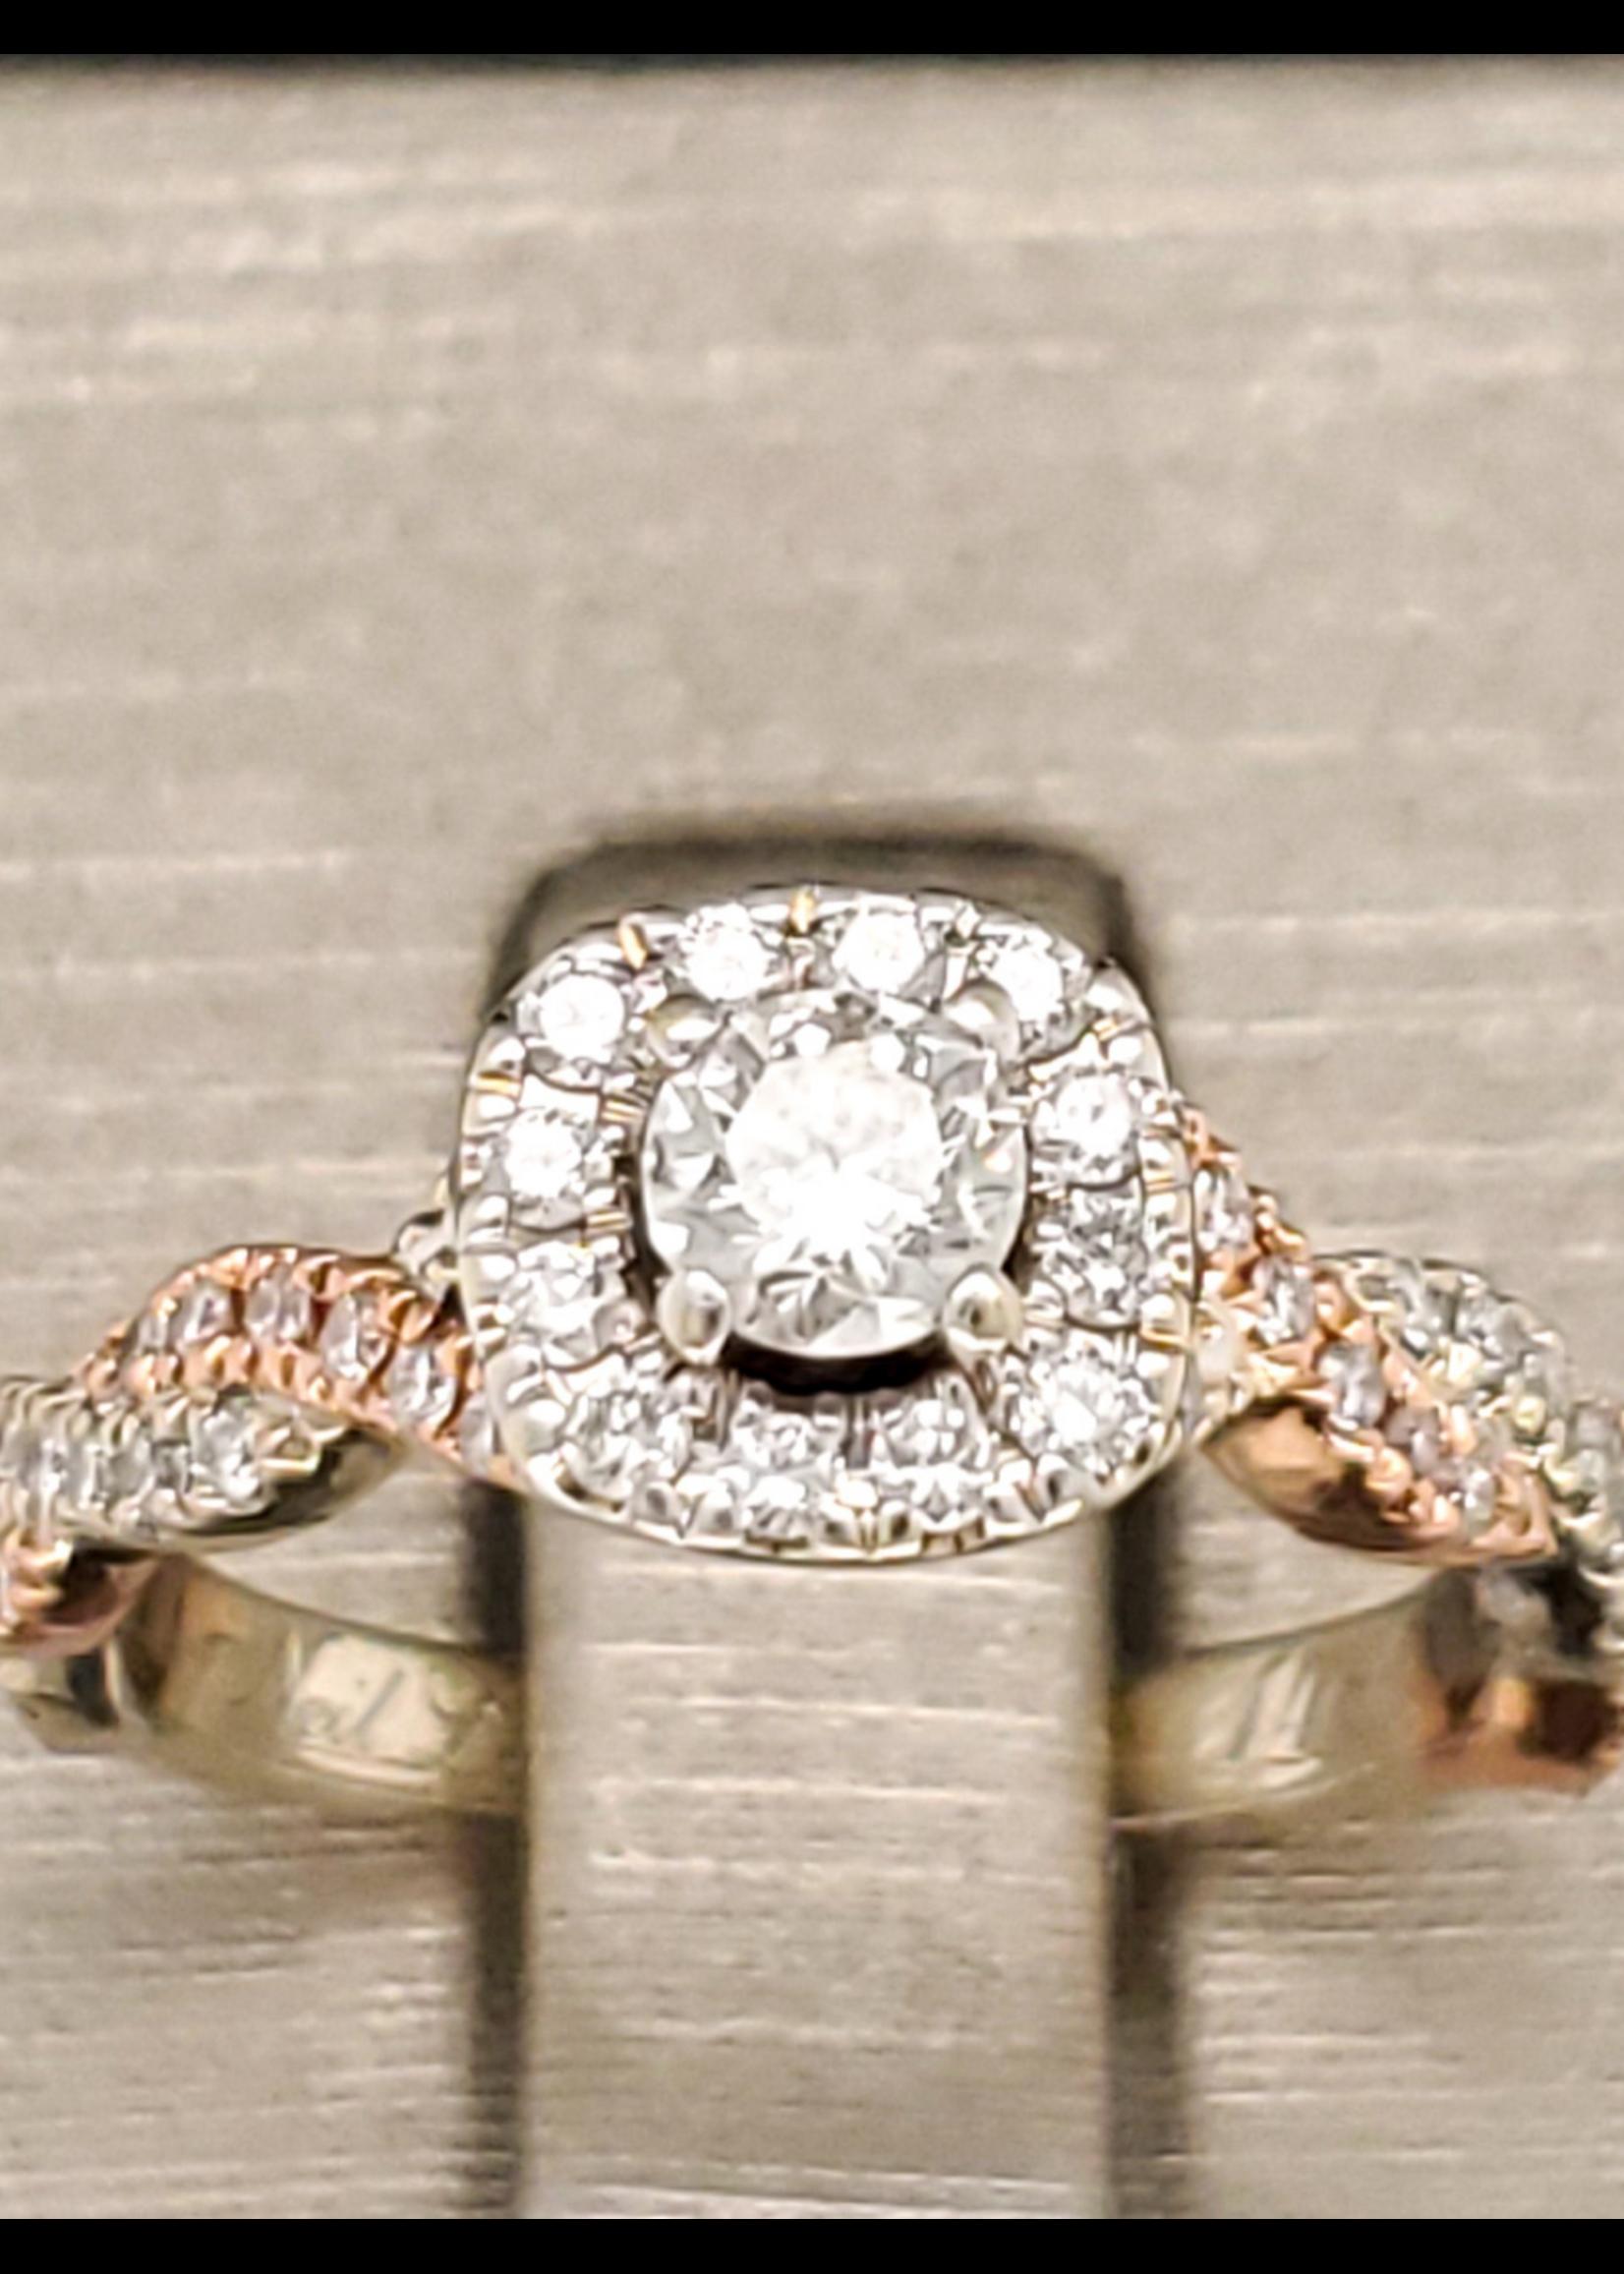 Vintage Jewellery Vintage 14k Neil Lane 2 Tone Halo Engagement Ring    Sz 4.5 2mm band